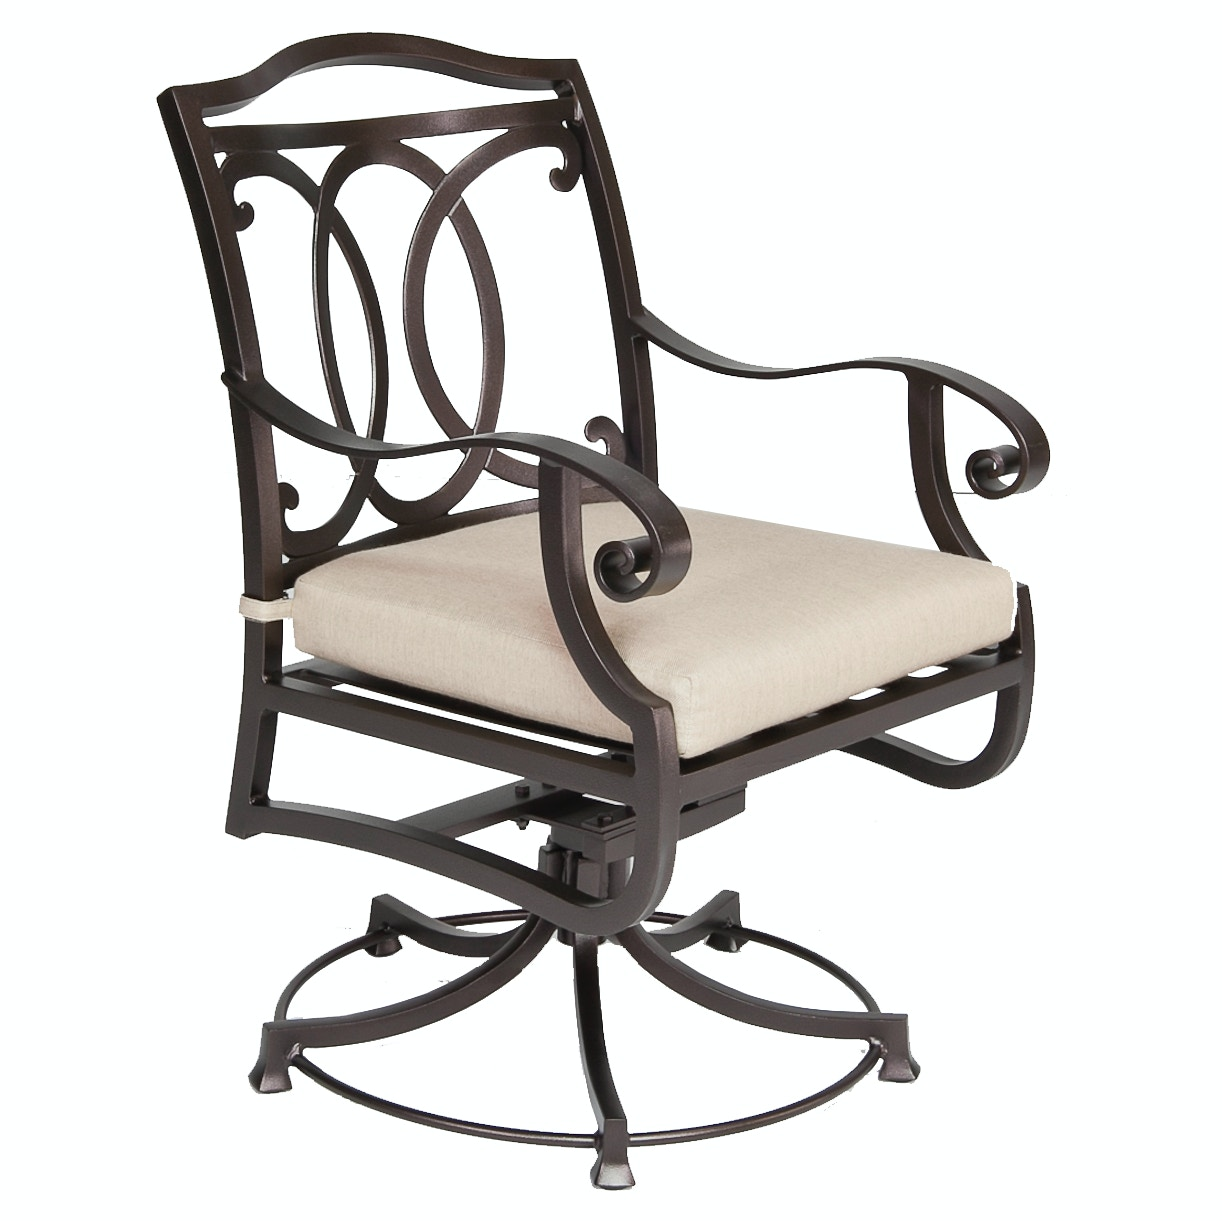 OW Lee Furniture Palisades Swivel Rocker Dining Arm Chair 4653 SR